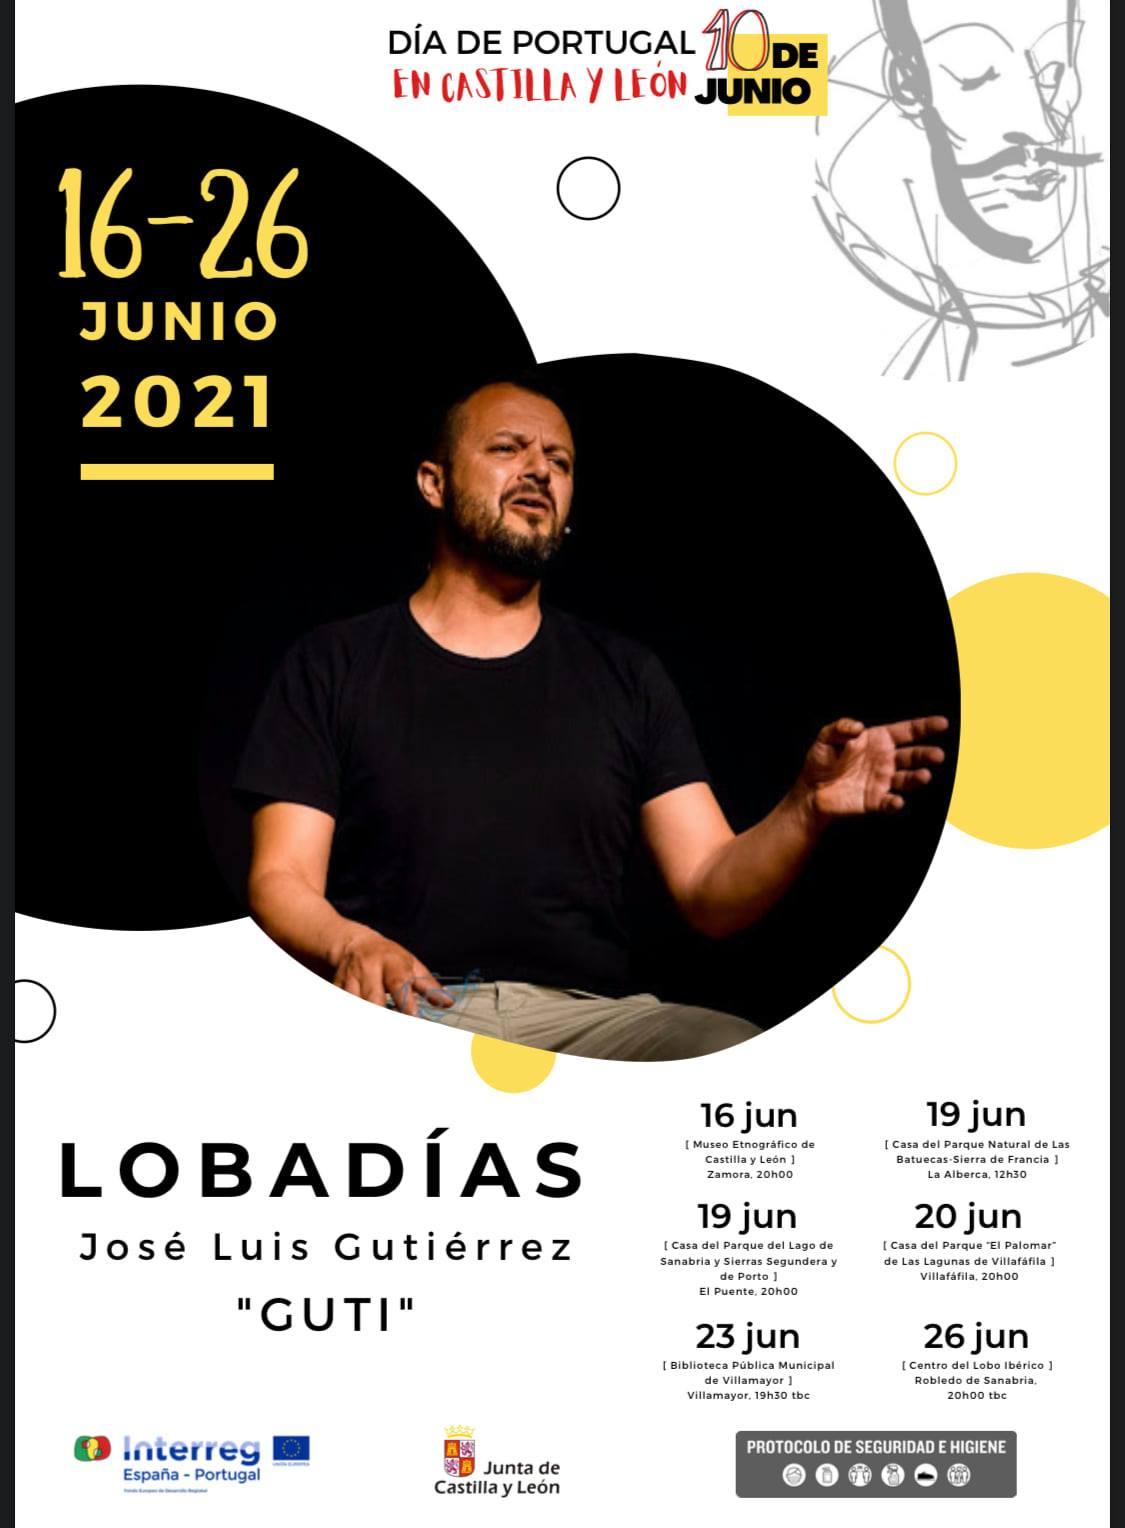 LOBADIAS